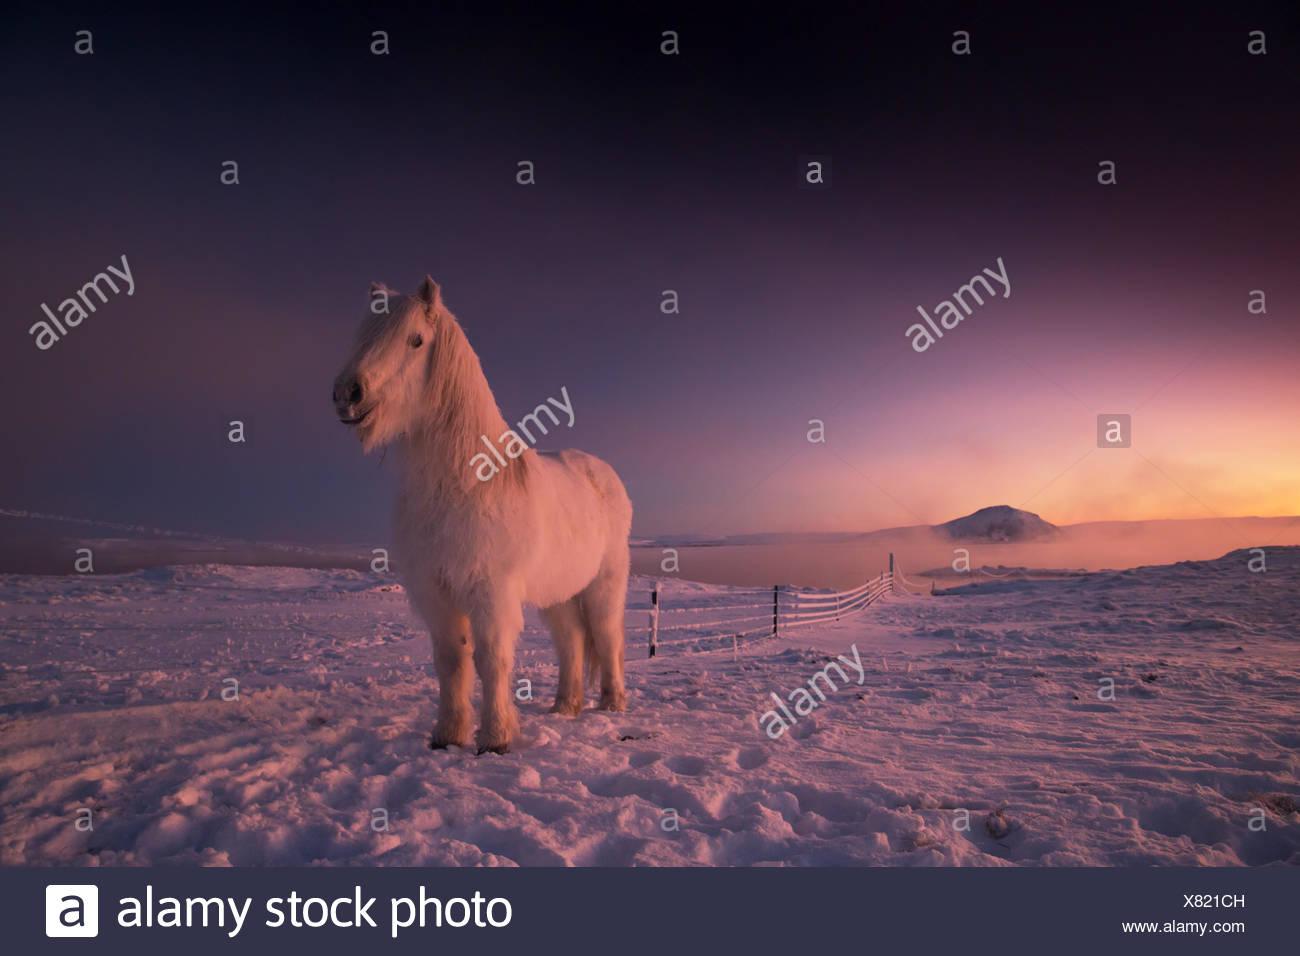 Icelandic horse, Equus ferus caballus, on snowy farm during sunset in Iceland. - Stock Image